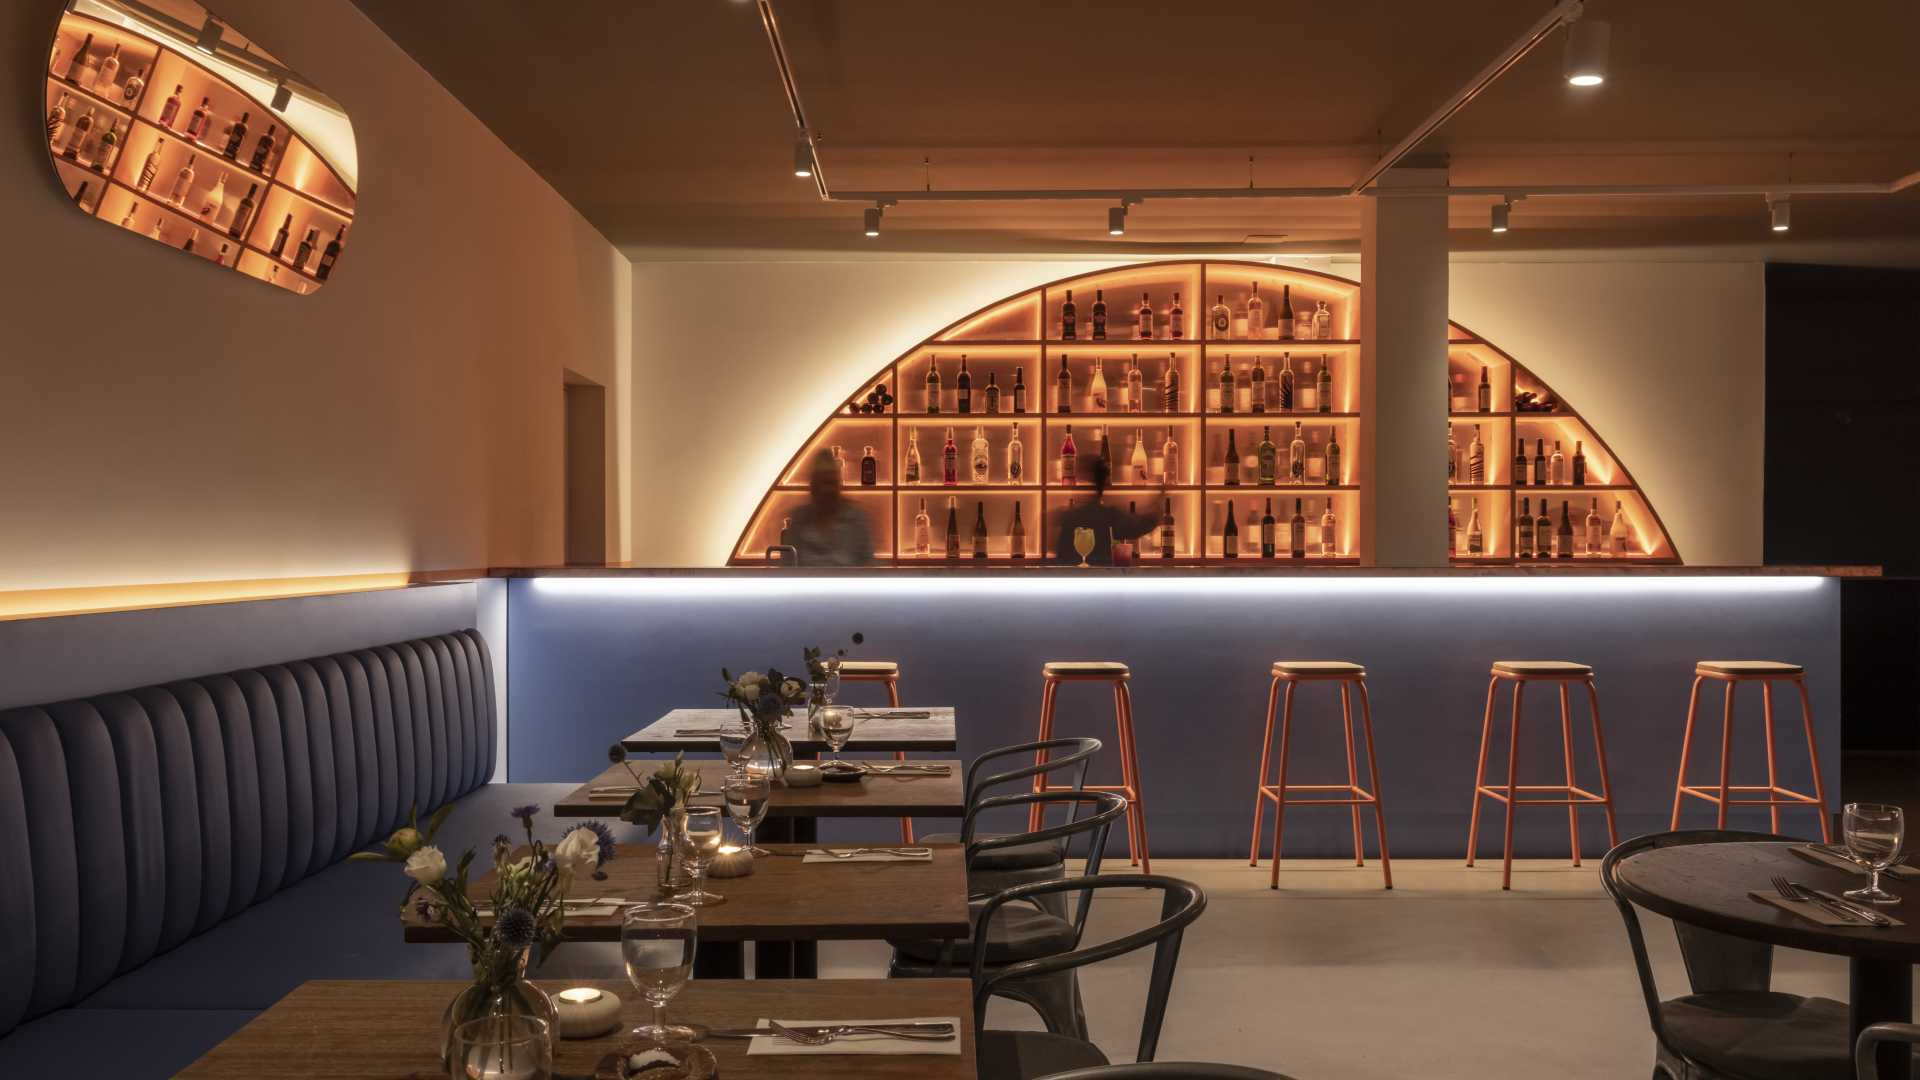 This is a photo of the new downstairs bar at Morito, Hackney Road.